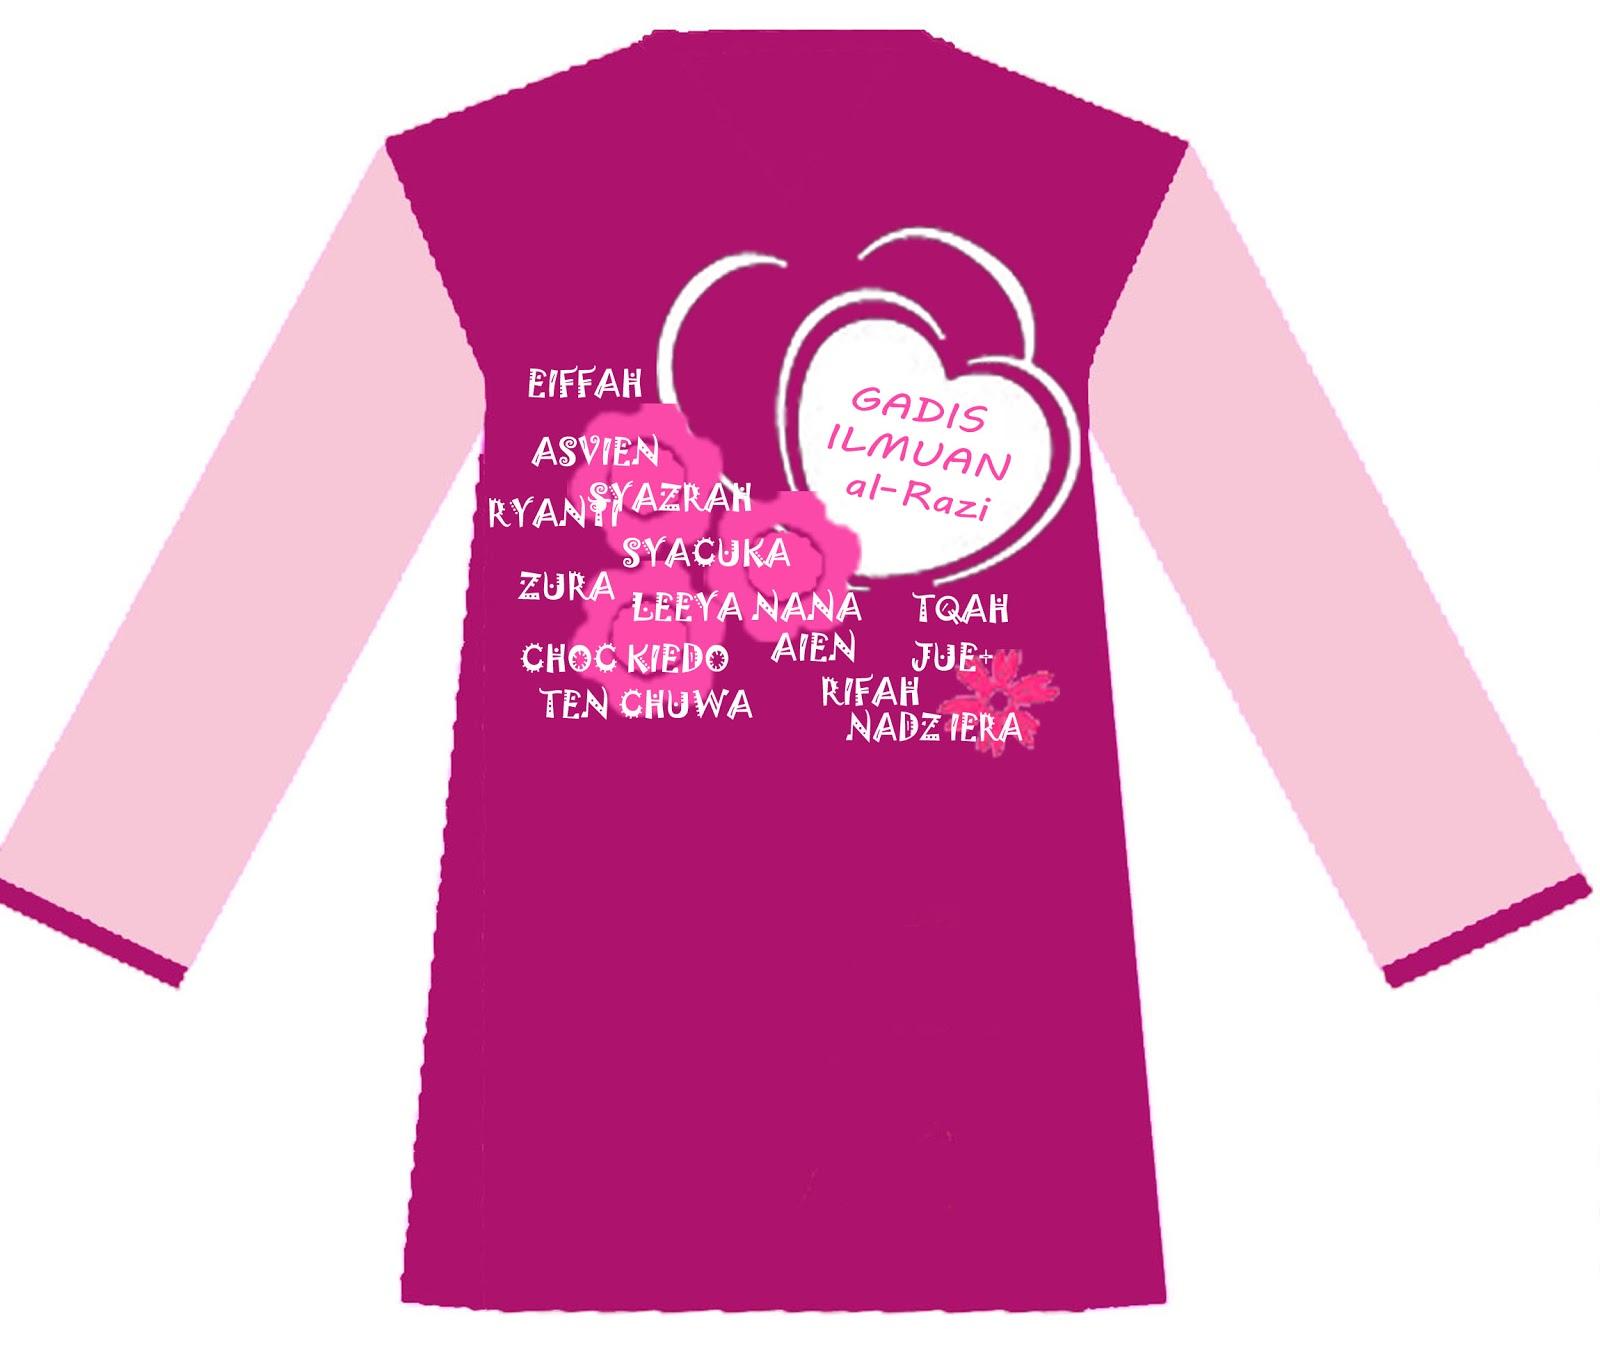 Design baju t shirt kelas - Baju Kelas Al Razi Back1 Download Image Design T Shirt